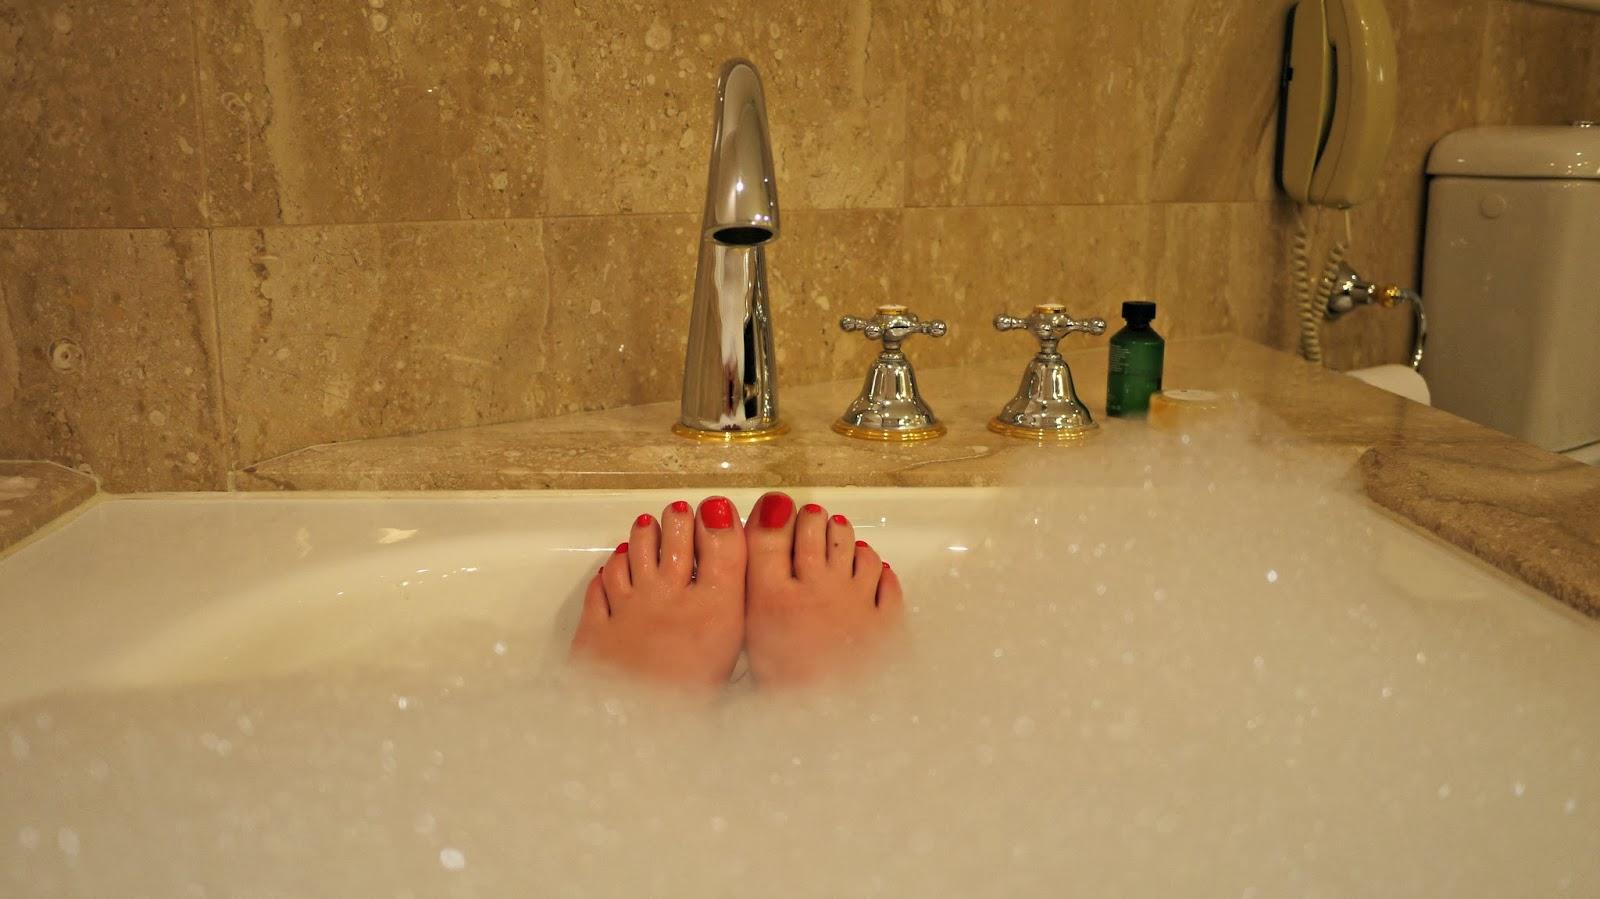 shangri la hotel sydney bathroom